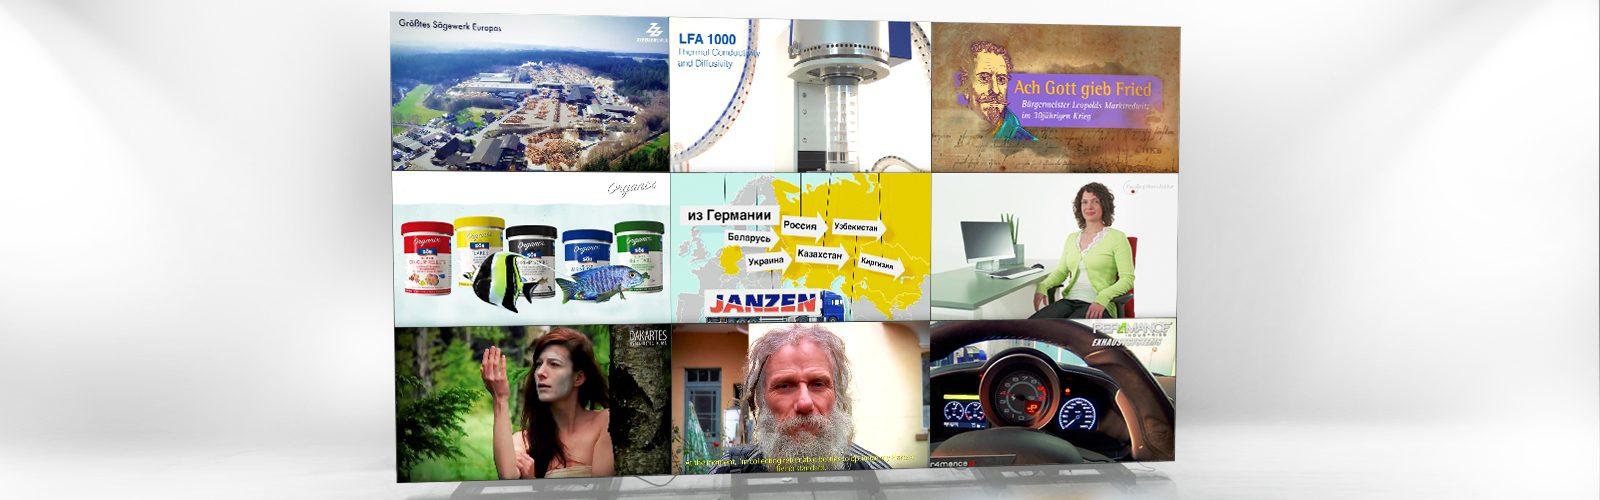 Imagefilm Video Produktvideo Werbevideo Film